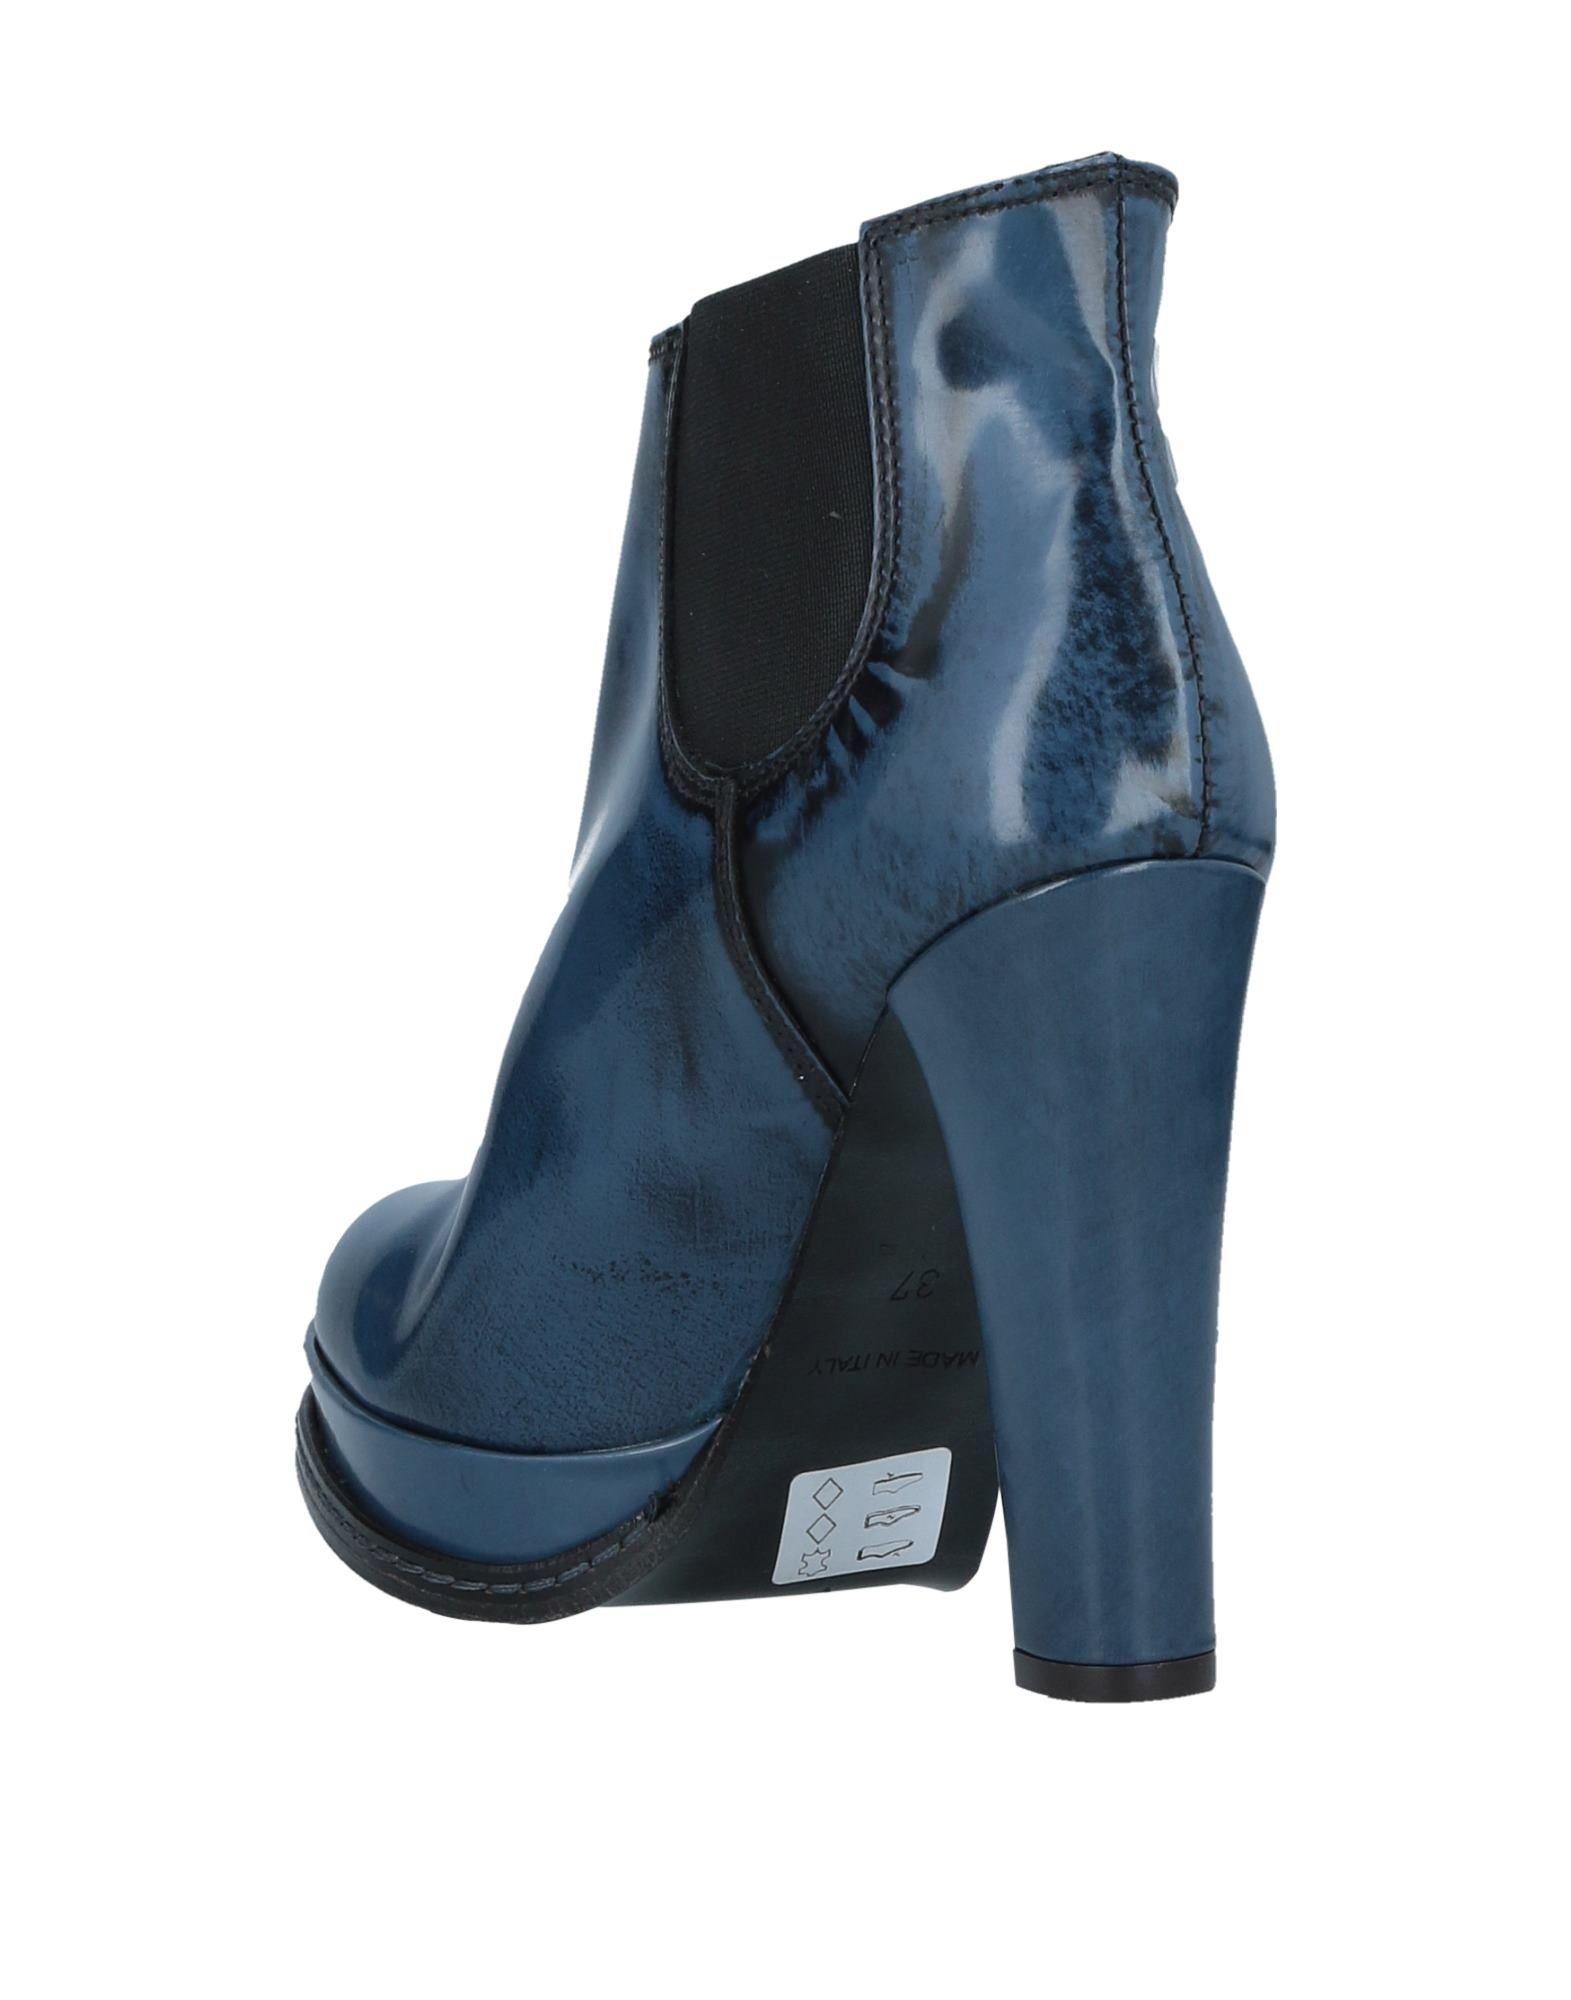 Eliana Bucci Chelsea Boots Damen  11532648IJ 11532648IJ 11532648IJ Gute Qualität beliebte Schuhe 7bddbf